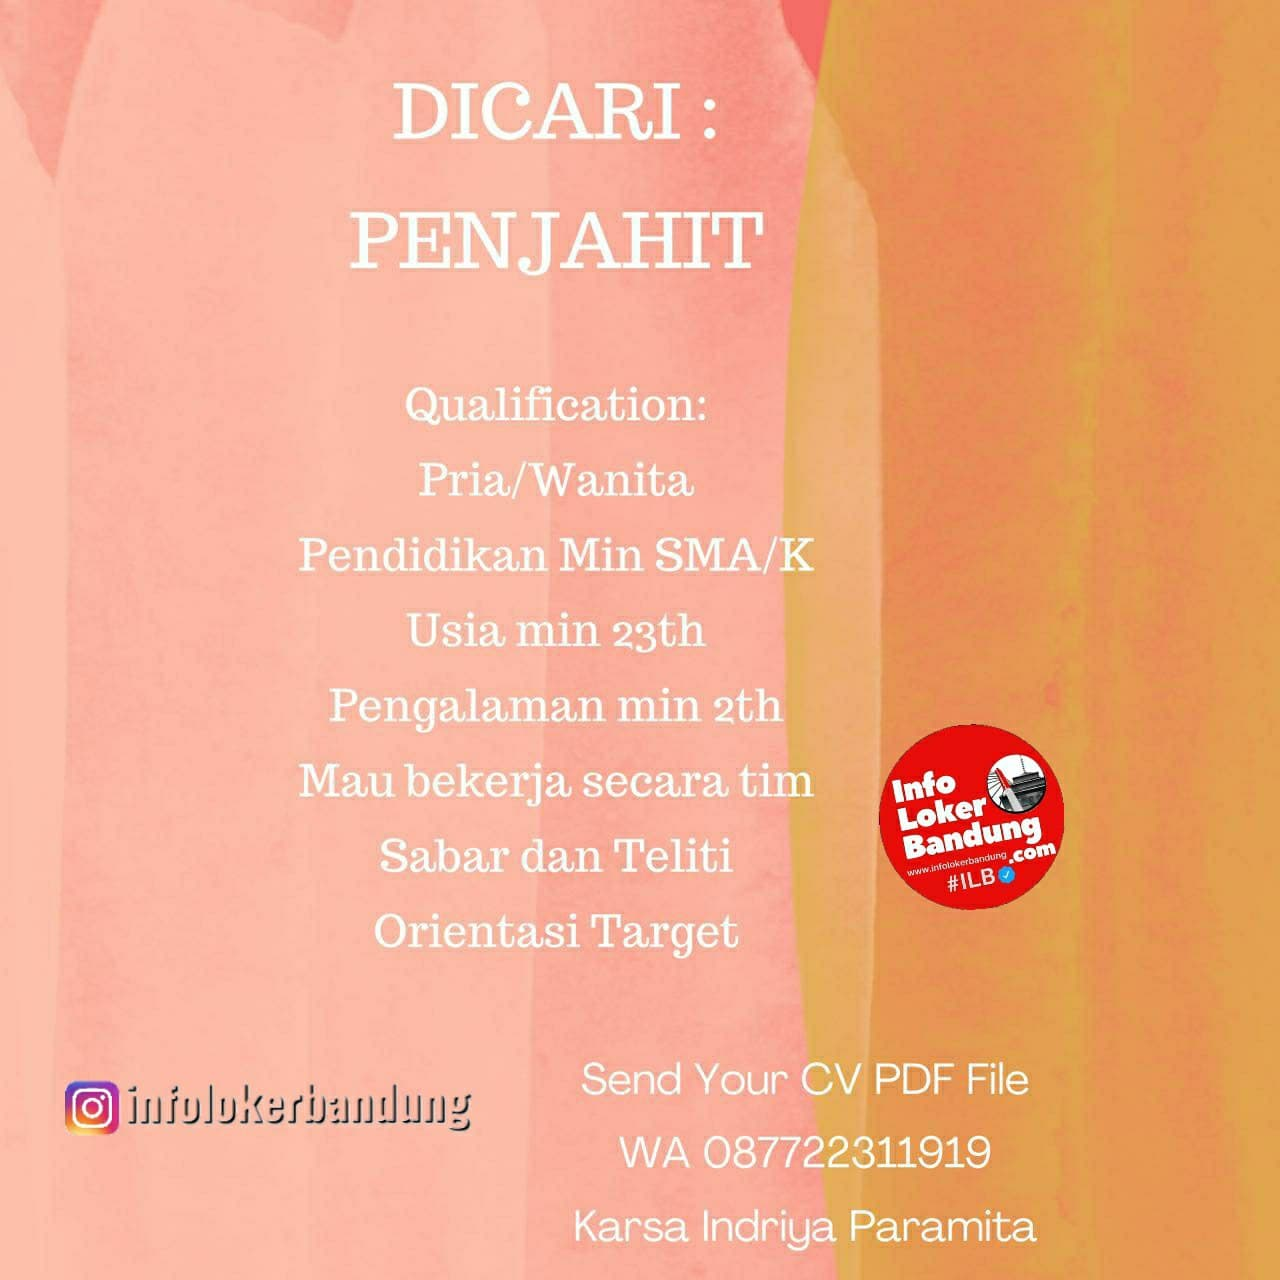 Lowongan Kerja PT. Karsa Indriya Paramita Bandung Januari 2021